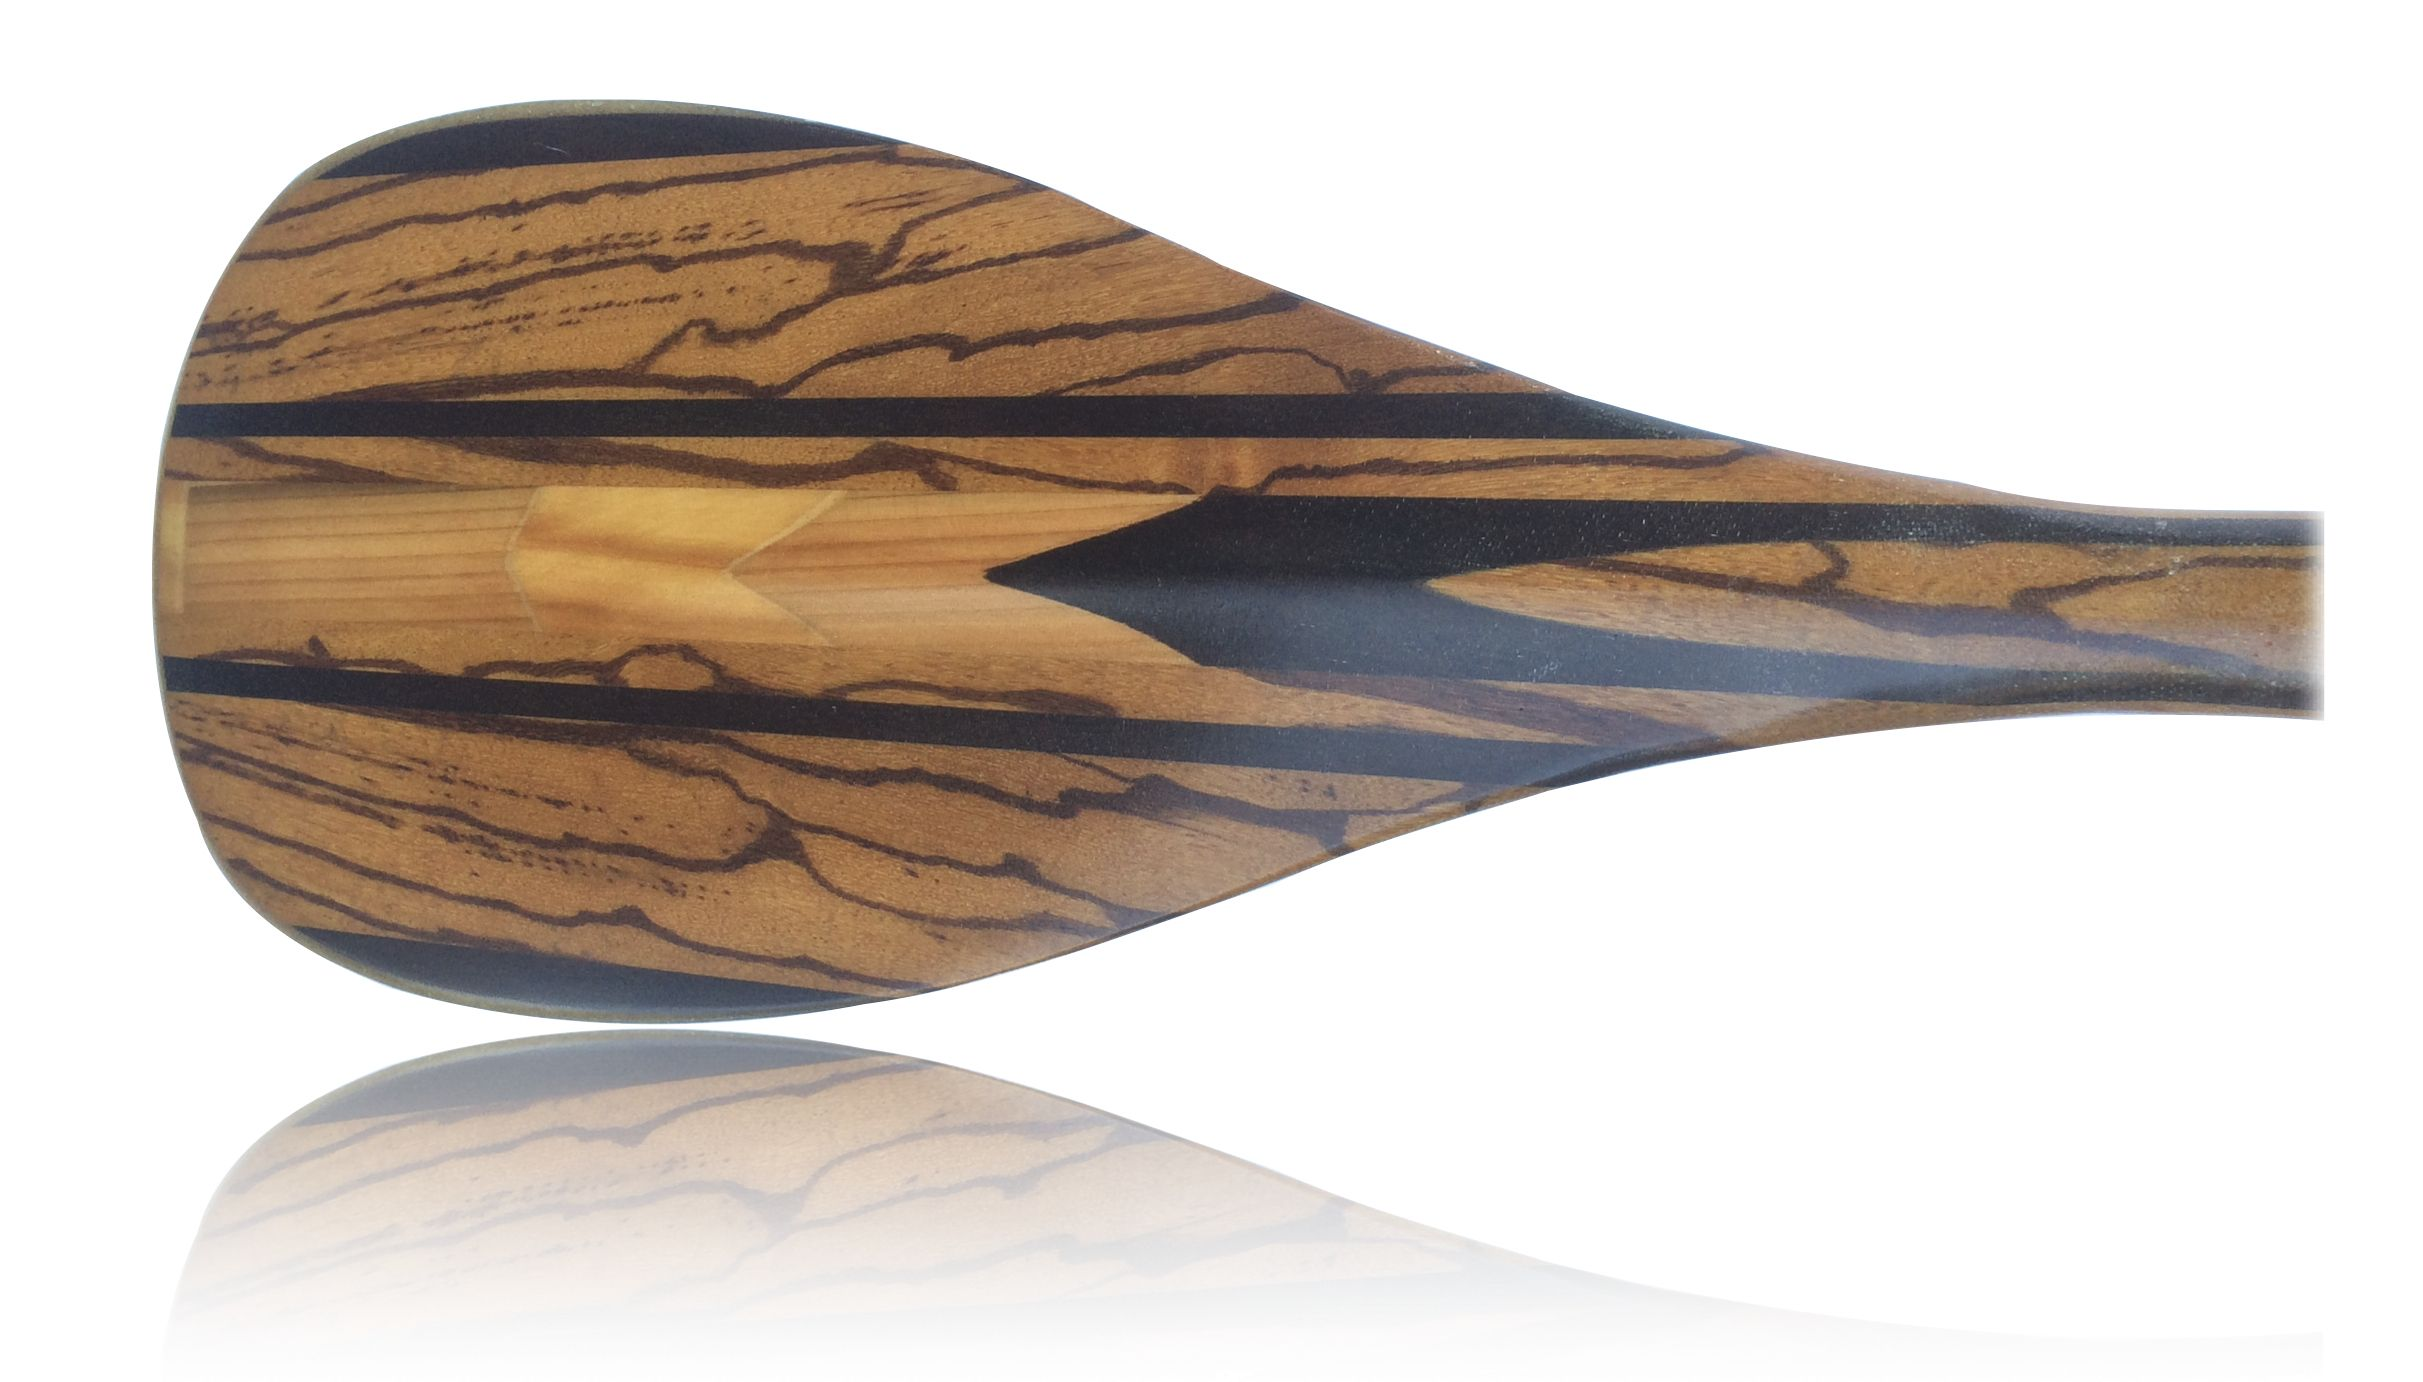 Deppen custom wood canoe paddles - Deppen Wood Carbon Fiber Stand Up Paddle Board Paddles